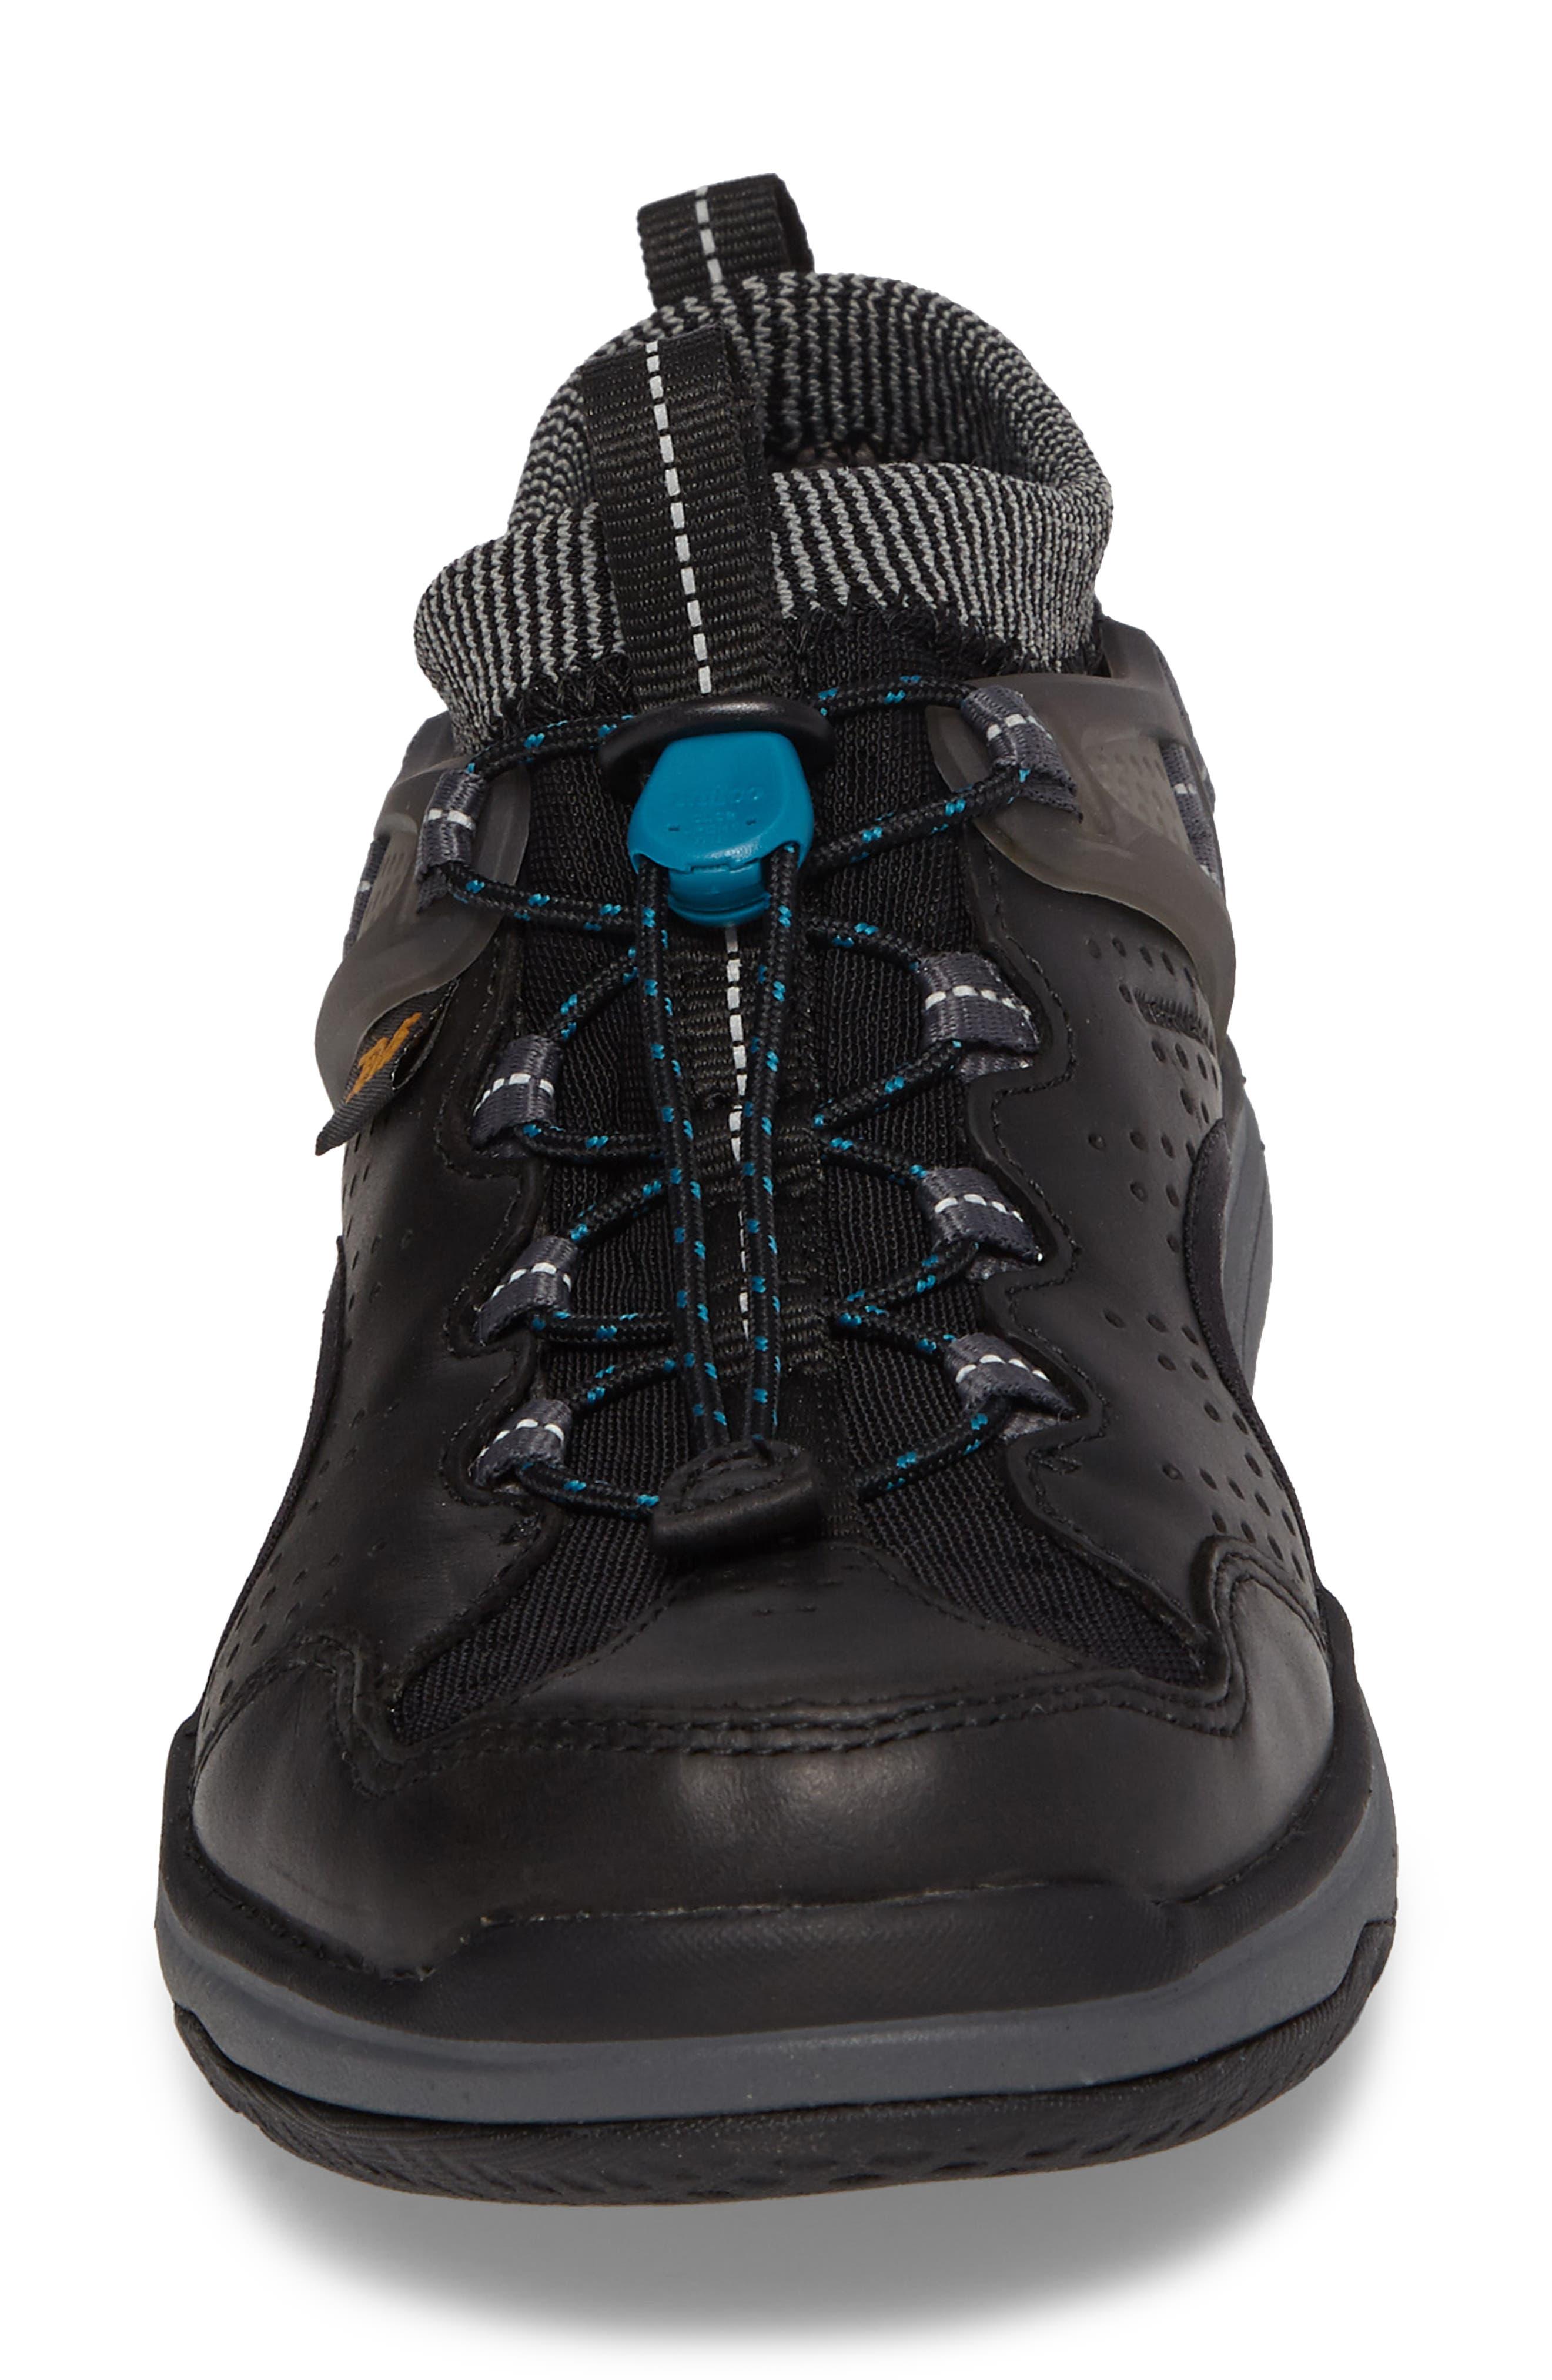 Terra Float Travel Sandal,                             Alternate thumbnail 4, color,                             Black Leather